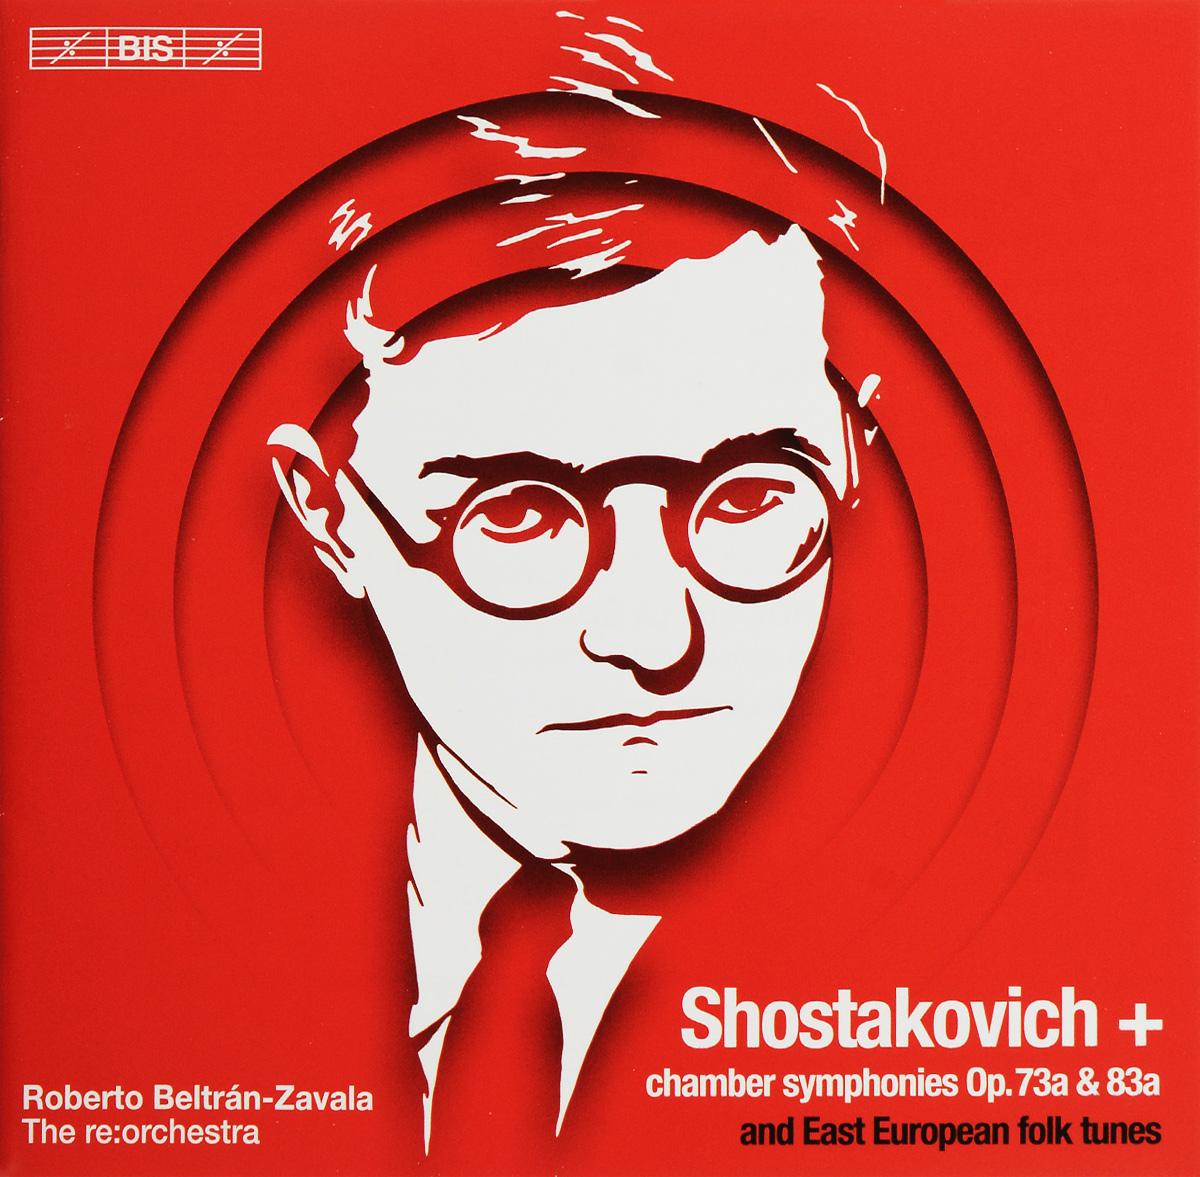 Фото - The re:orchestra,Roberto Beltran-Zavala The re:orchestra, Roberto Beltran-Zavala. Shostakovich. Chamber Symphonies Op. 73a & 83a (SACD) jan beltran nora